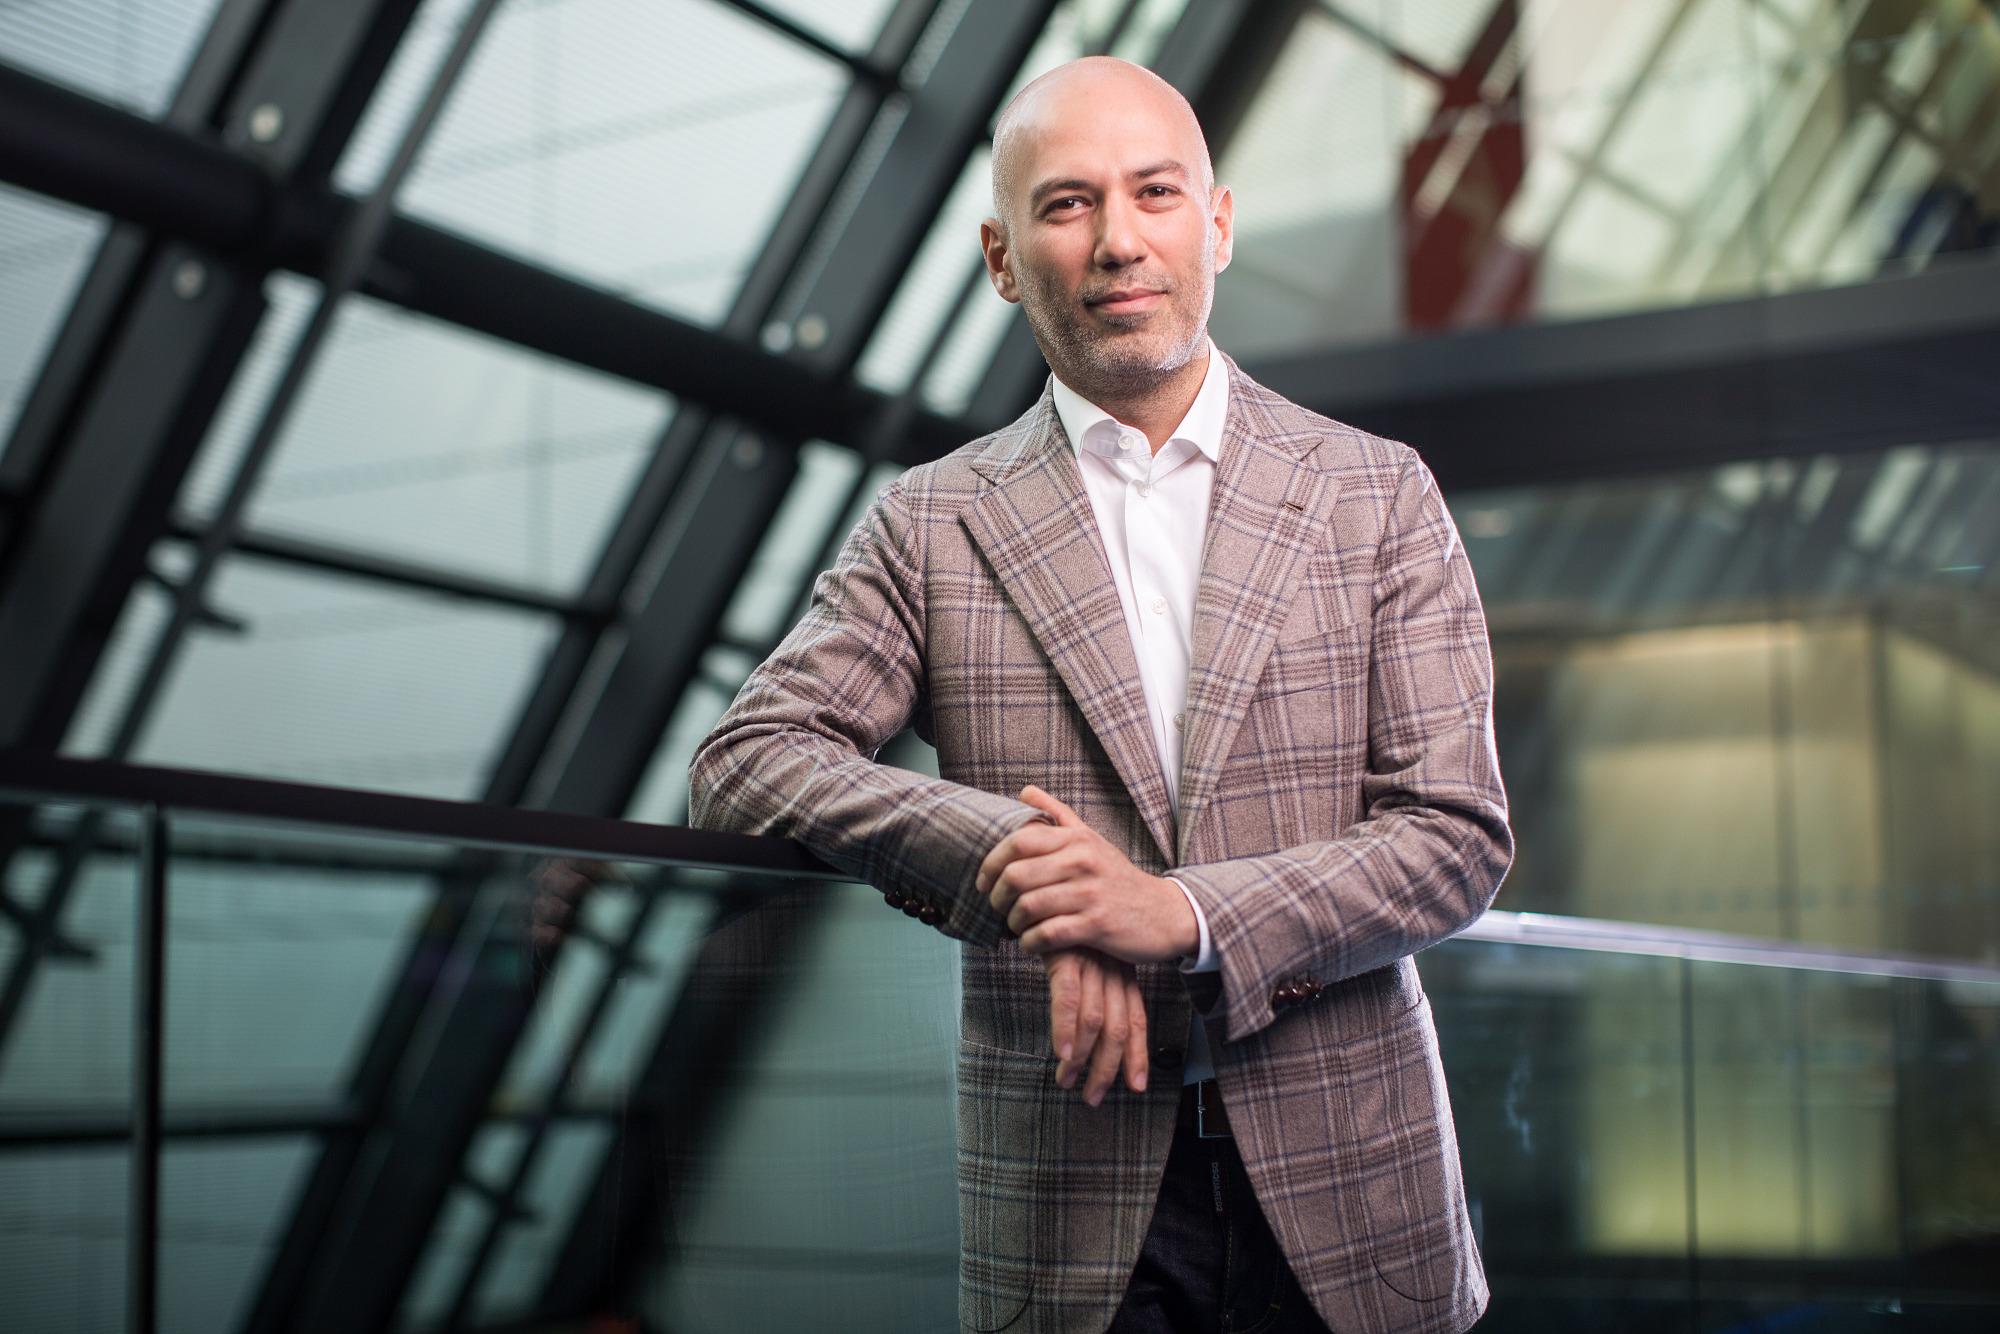 Kinetik Founder And Chief Executive Officer Denis Sverdlov Interview